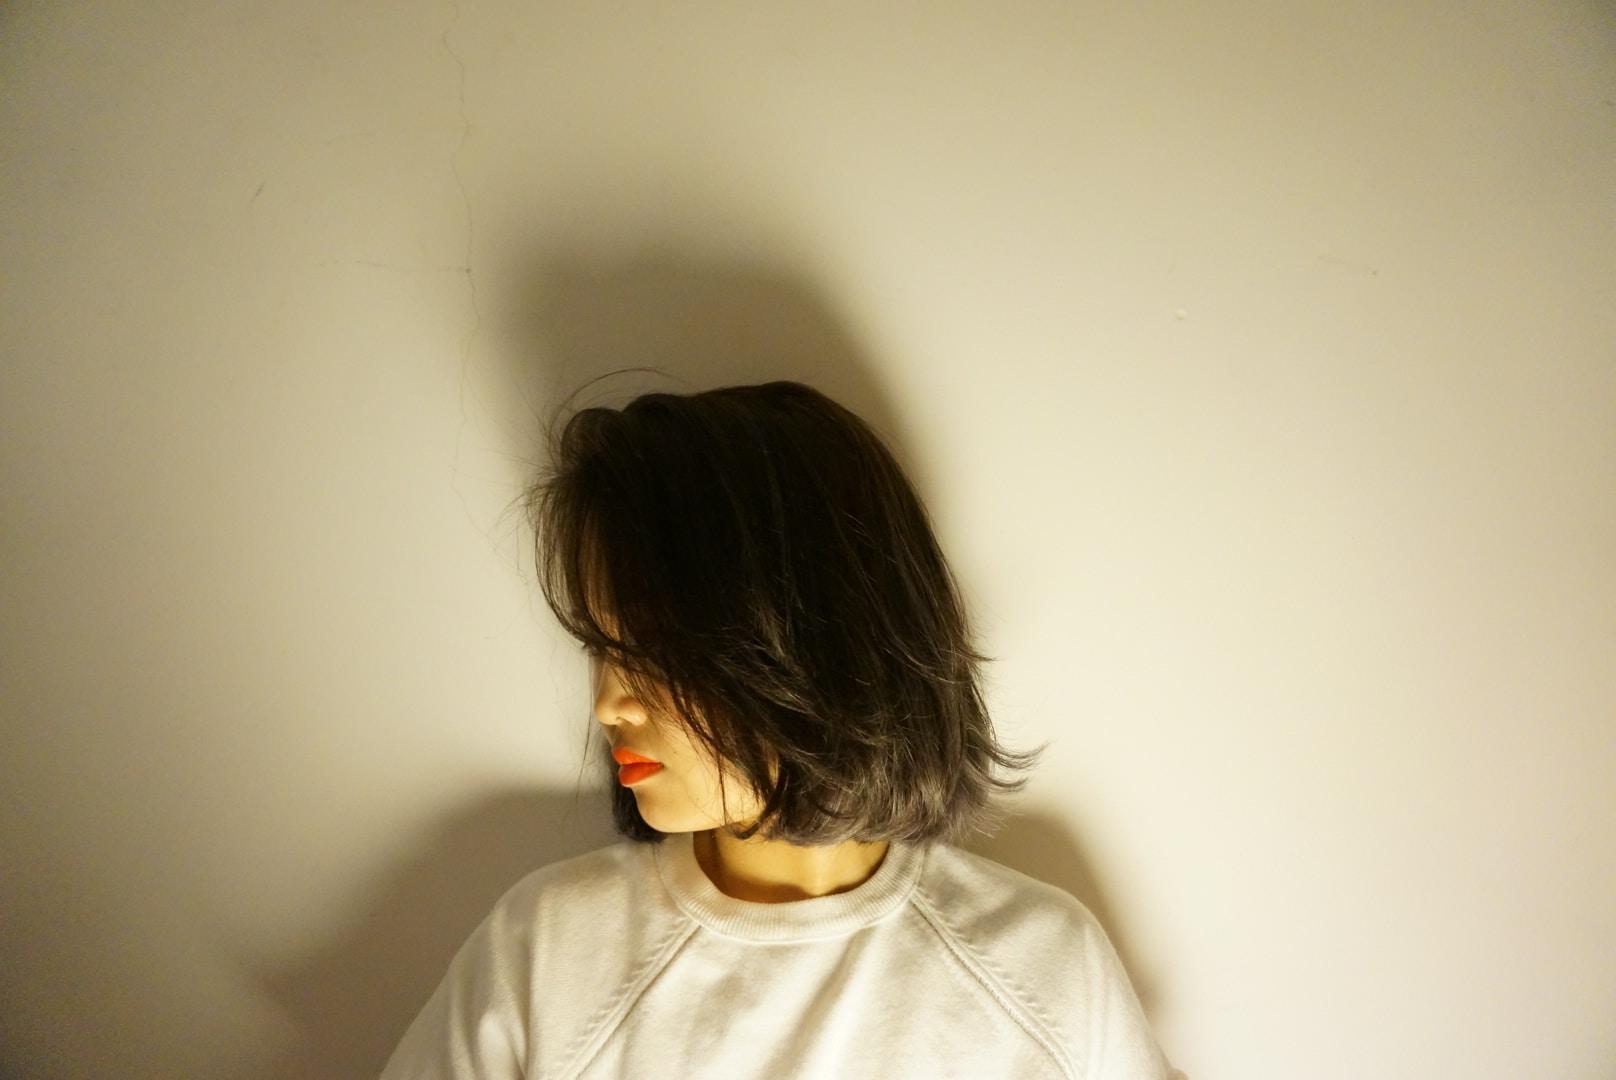 Go to yan lee's profile